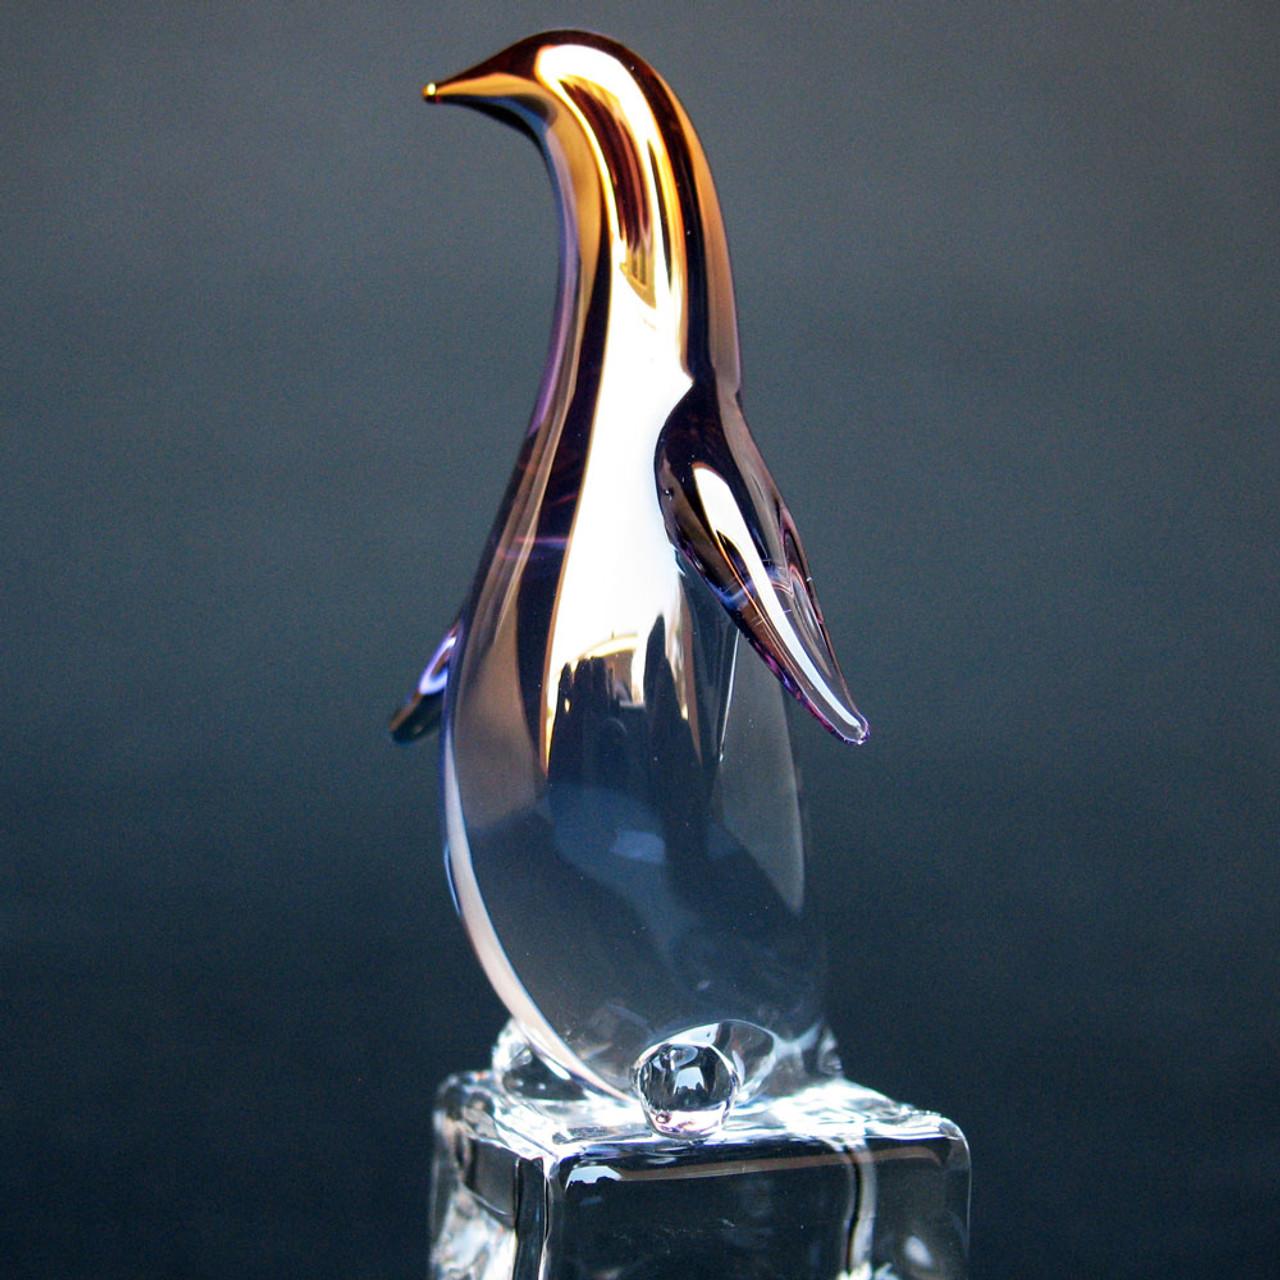 Glass sulphide penguins on ice press-paper